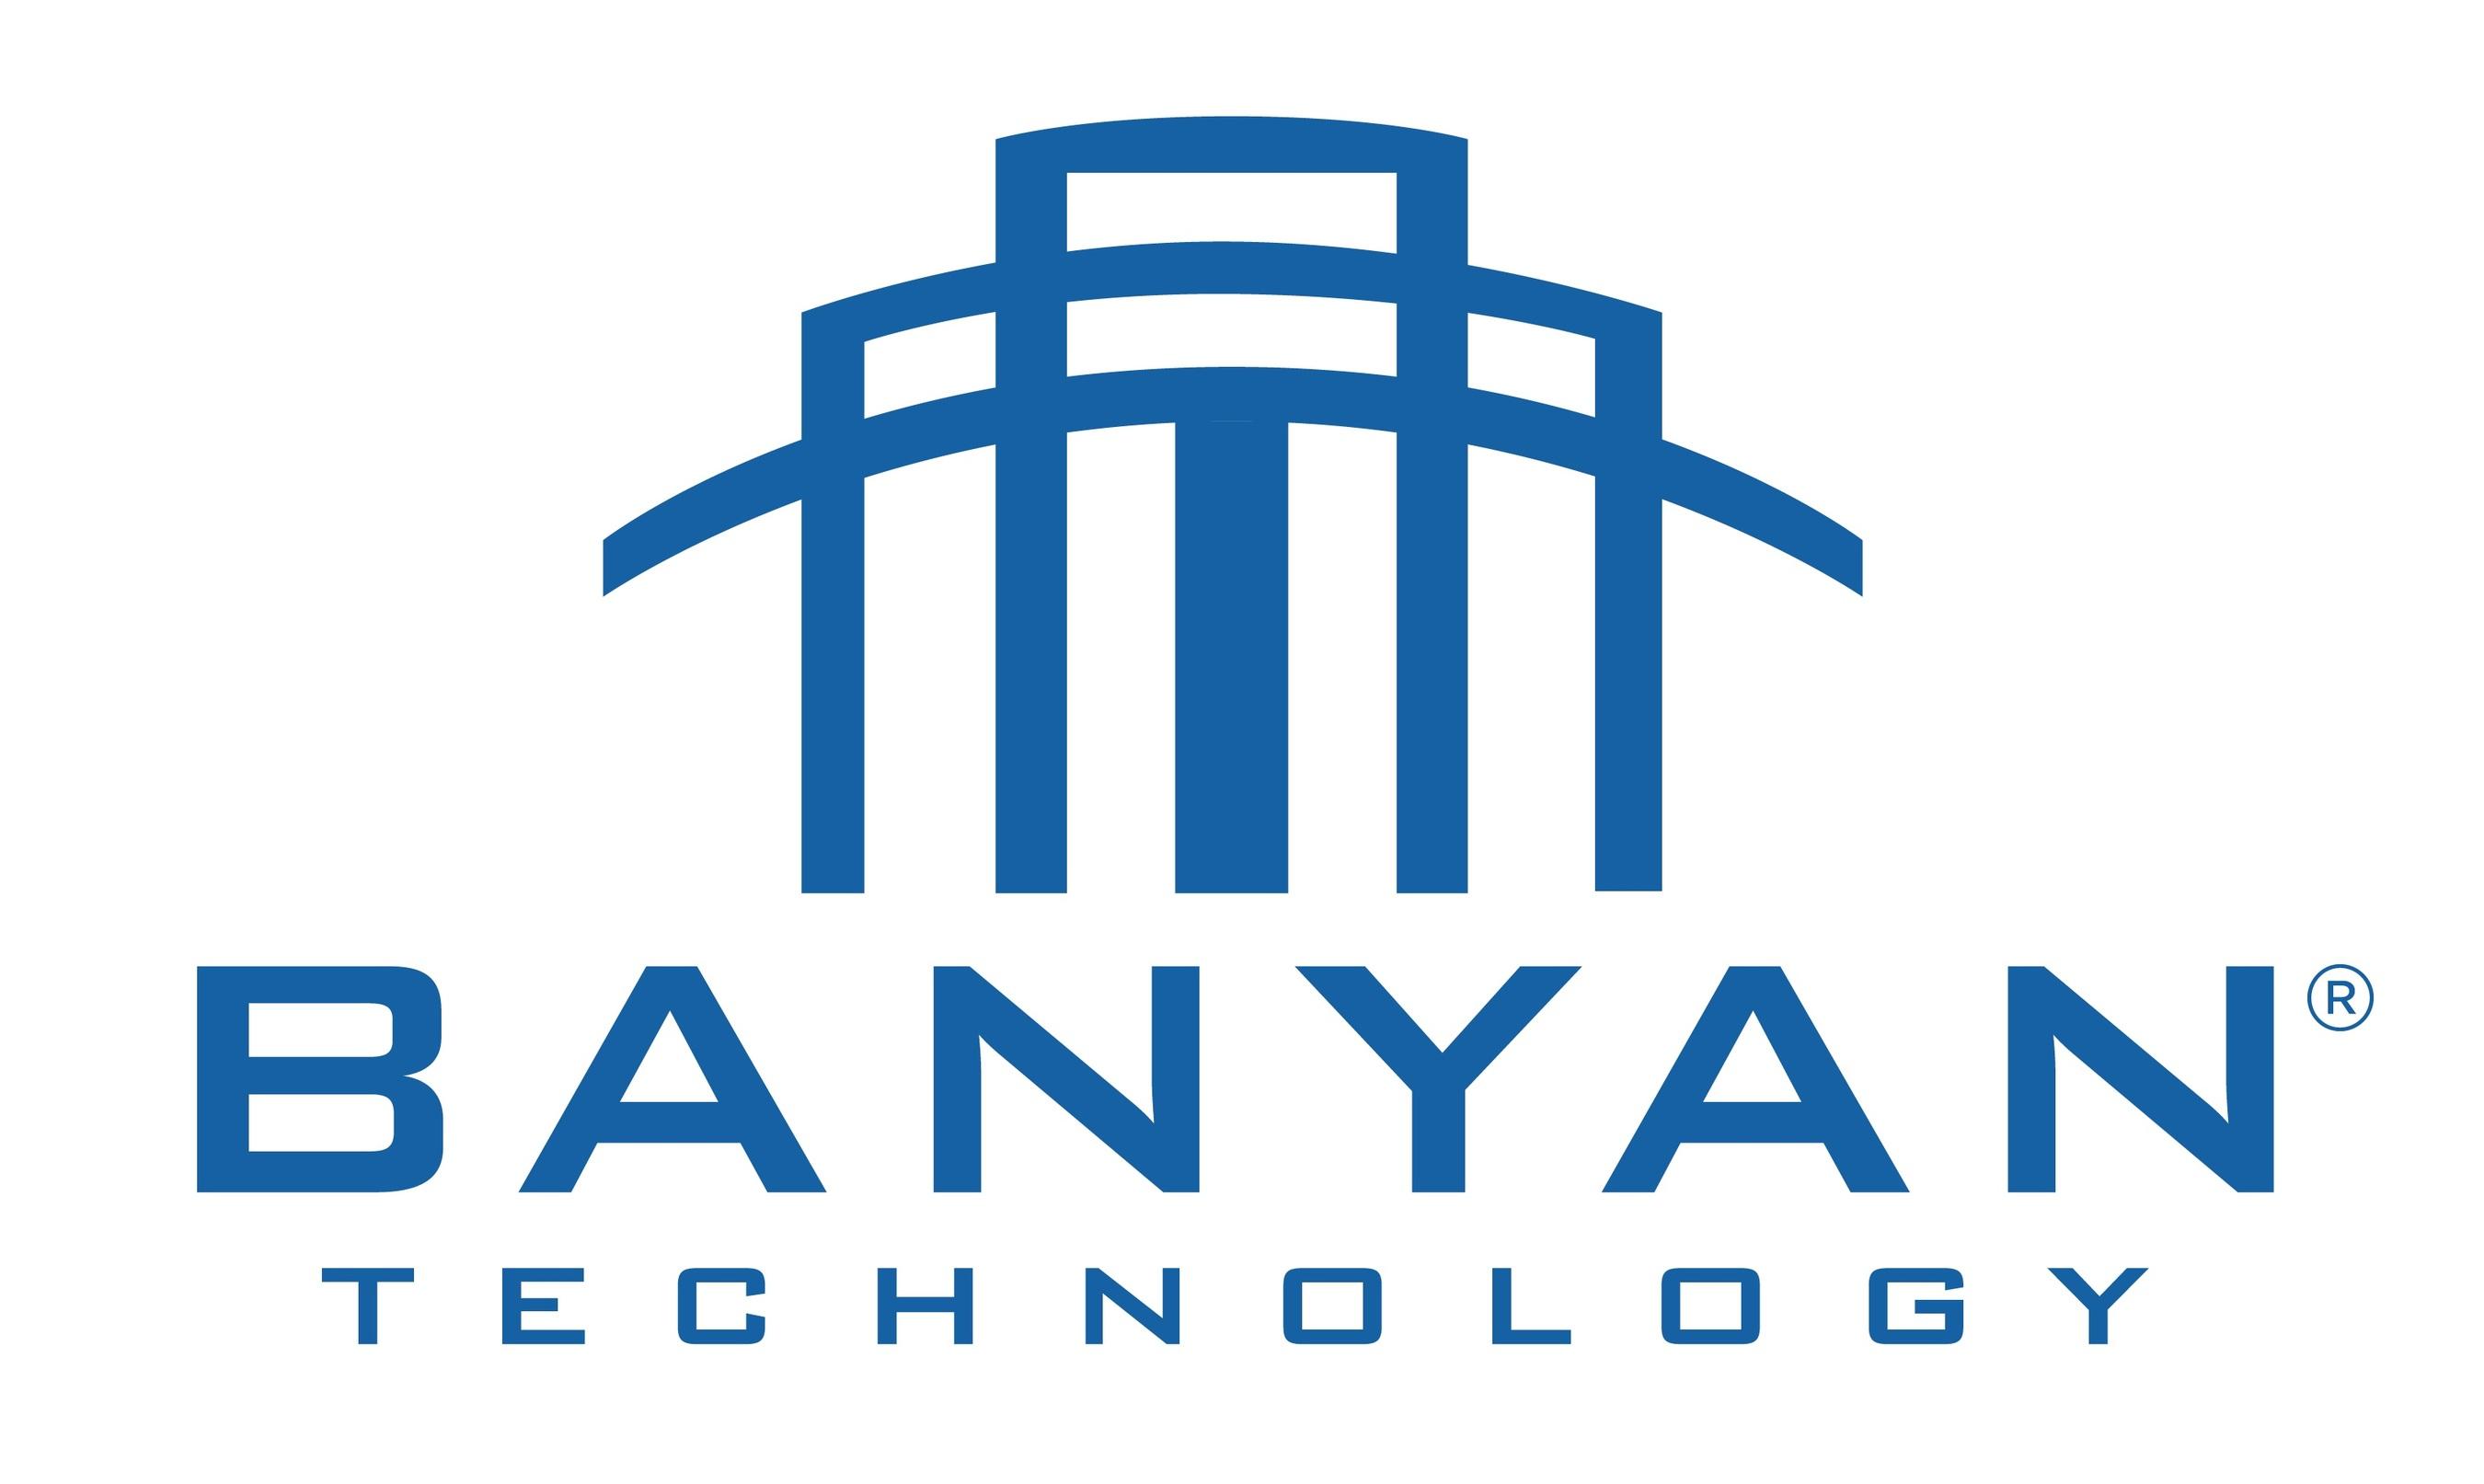 (PRNewsfoto/Banyan Technology)